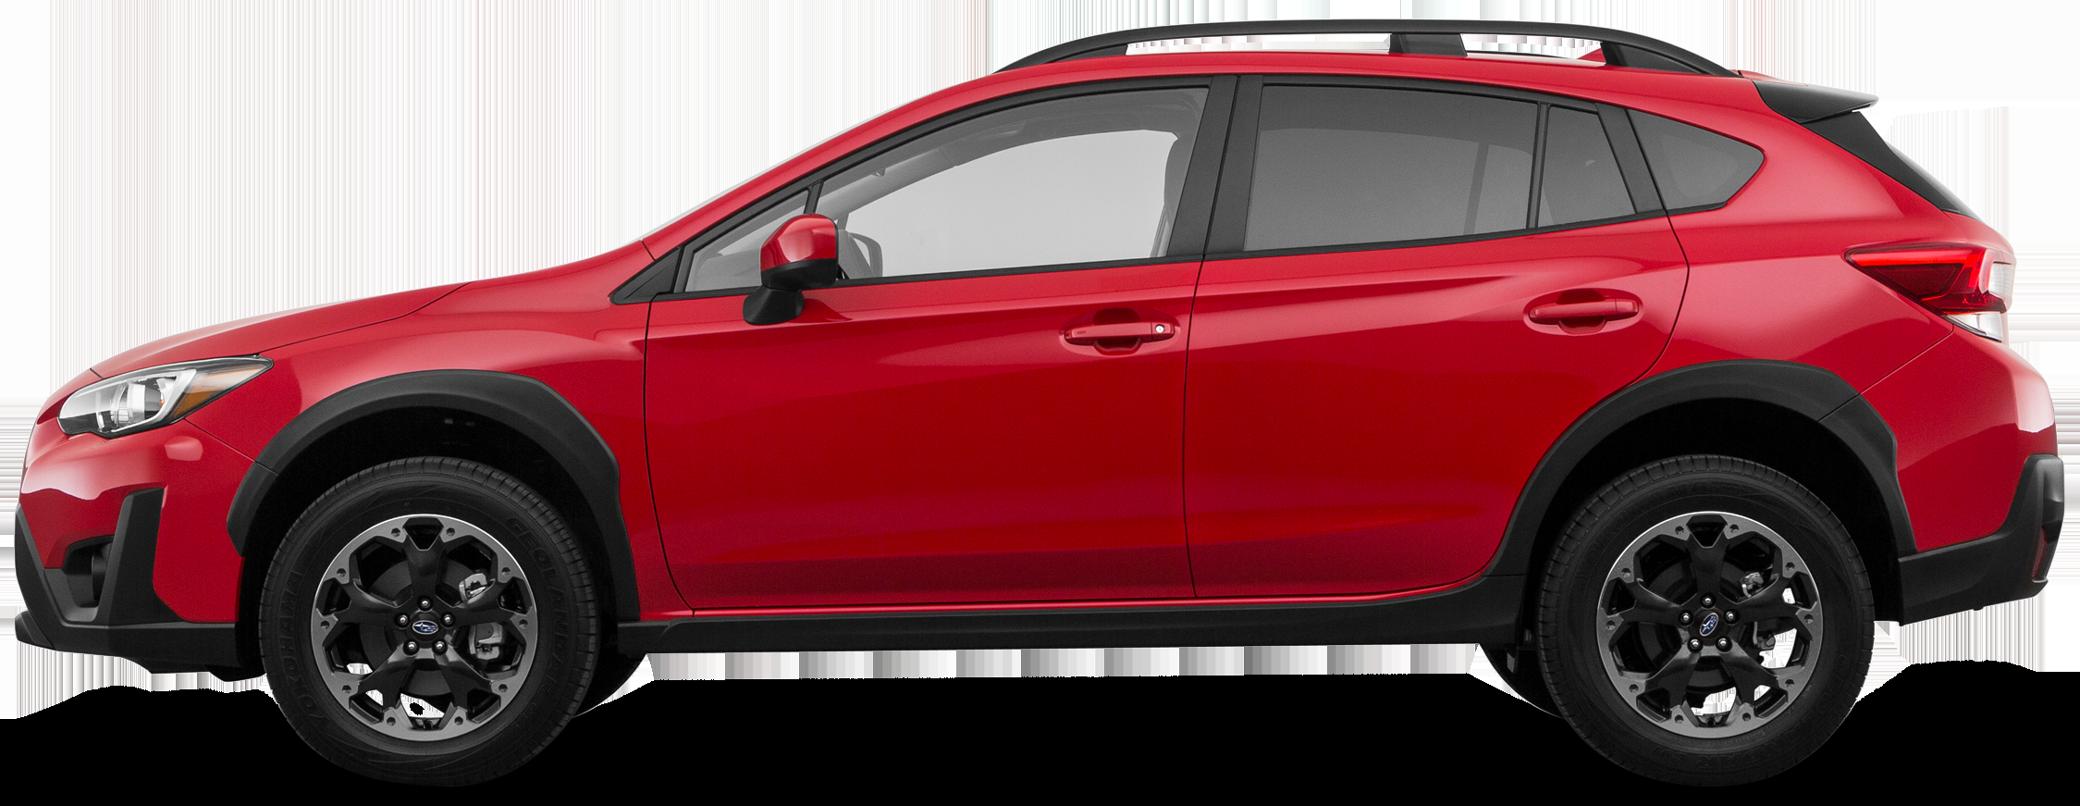 2021 Subaru Crosstrek SUV Premium